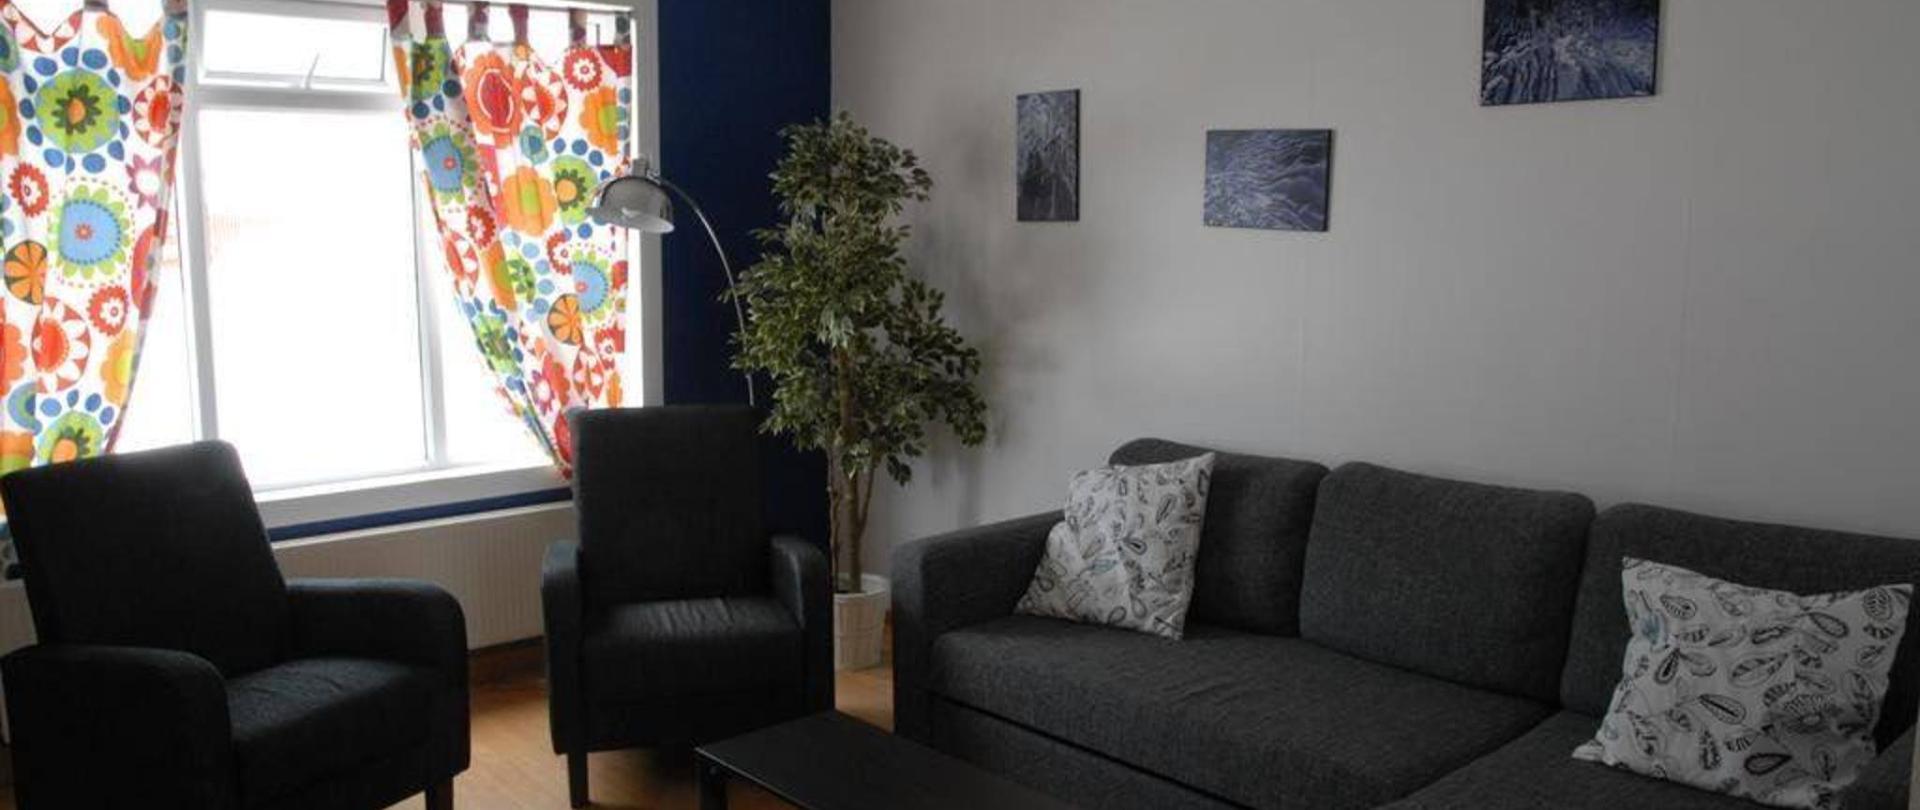 grundarfj-rdur-hostel-homepage-1.jpg